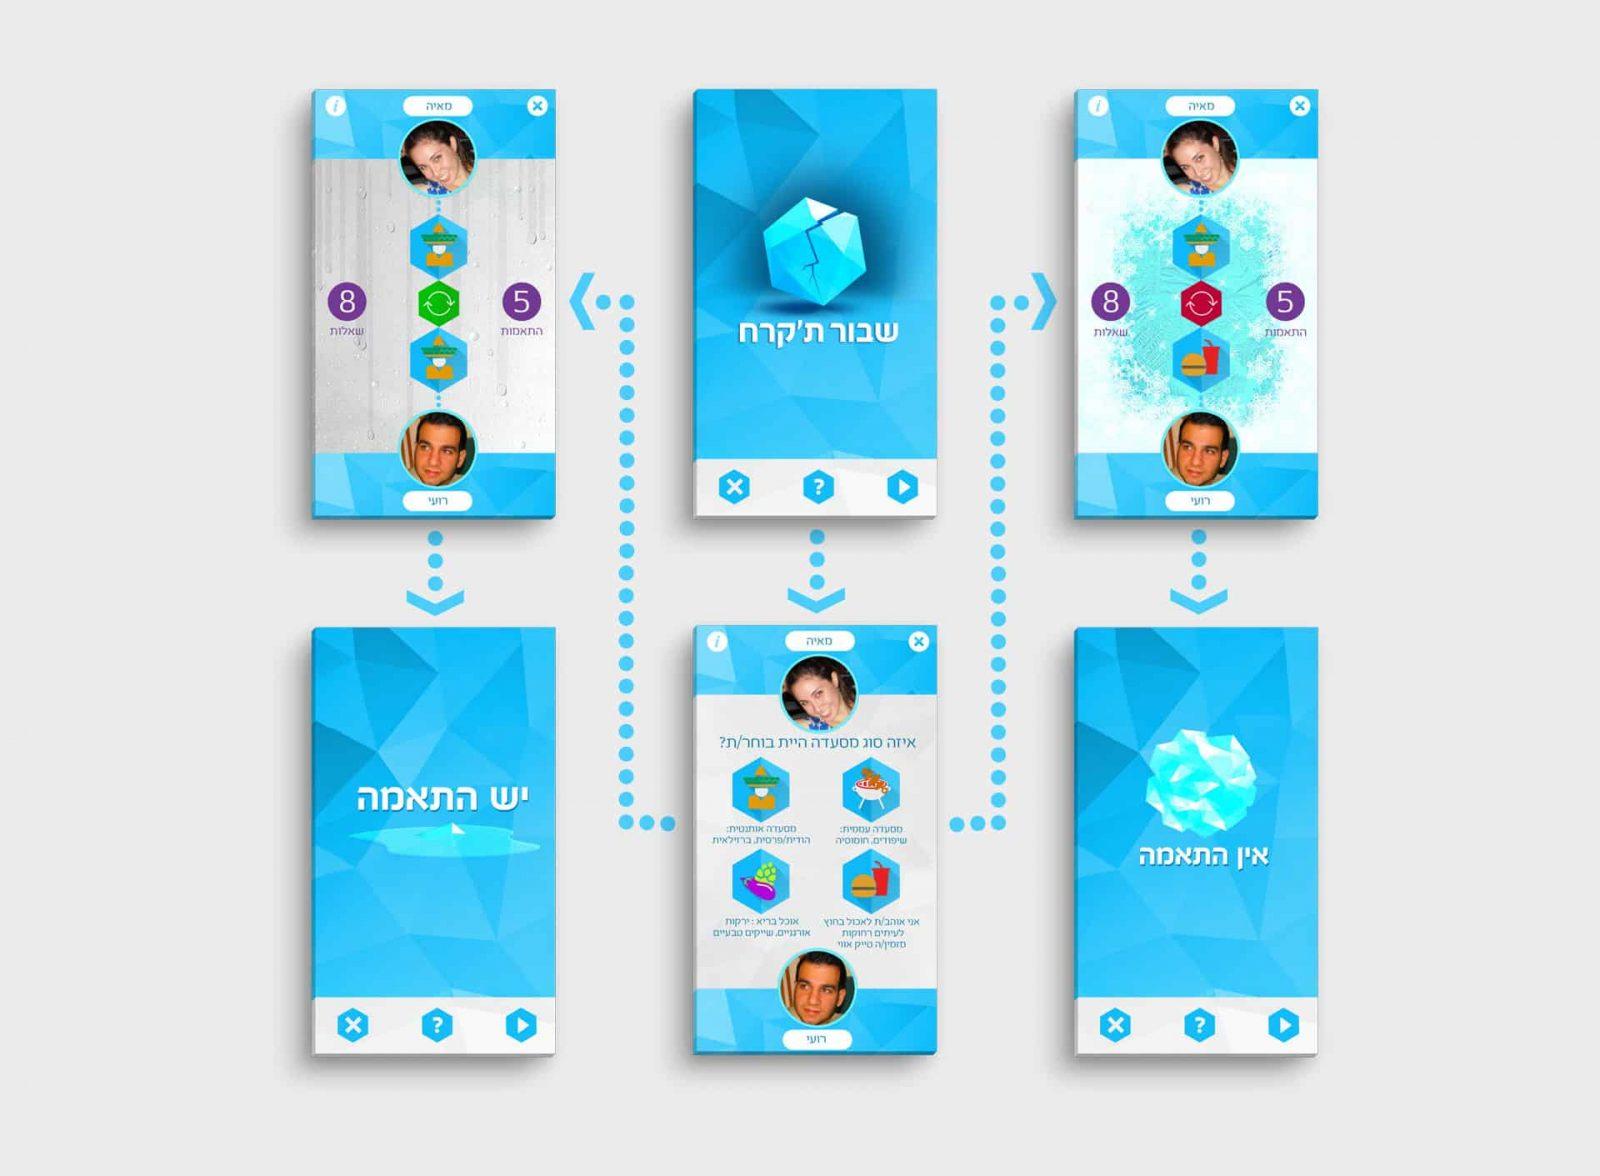 ice, עיצוב אפליקציה, מיתוג אפליקציה